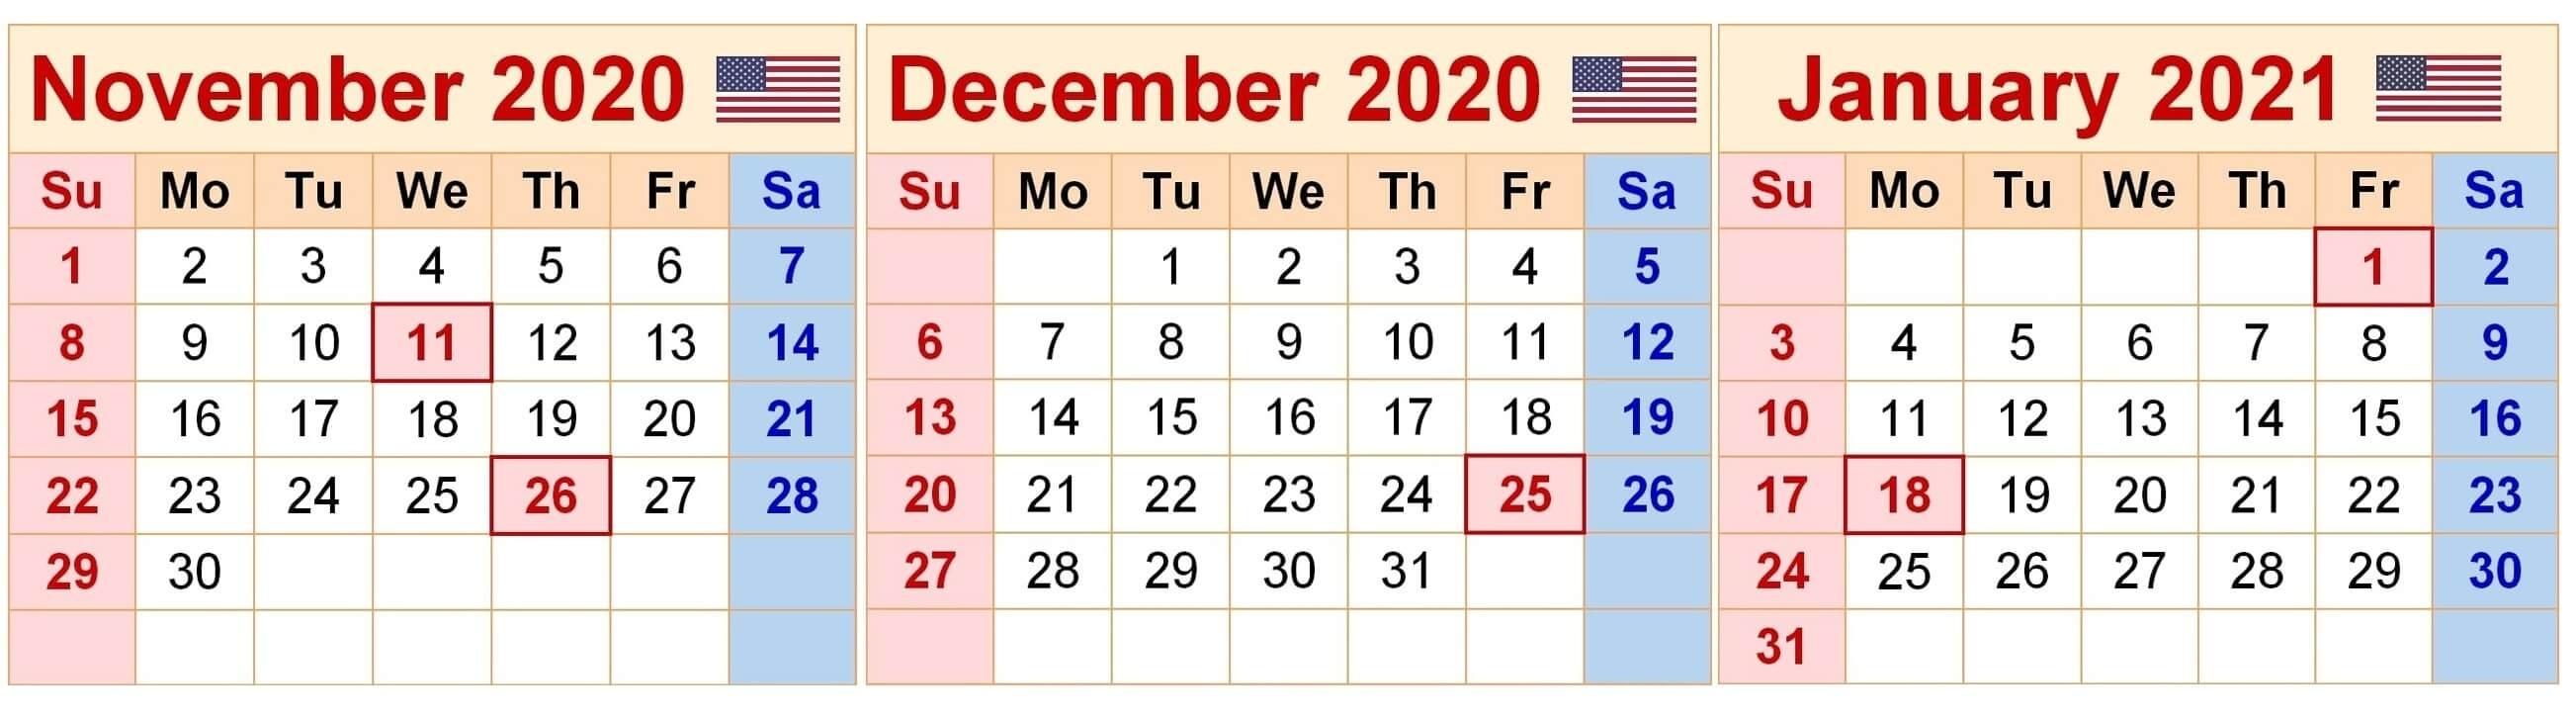 Free November 2020 To January 2021 Calendar For Planning - Set Your Plan & Tasks With Best Ideas November December 2020 January 2021 Calendar